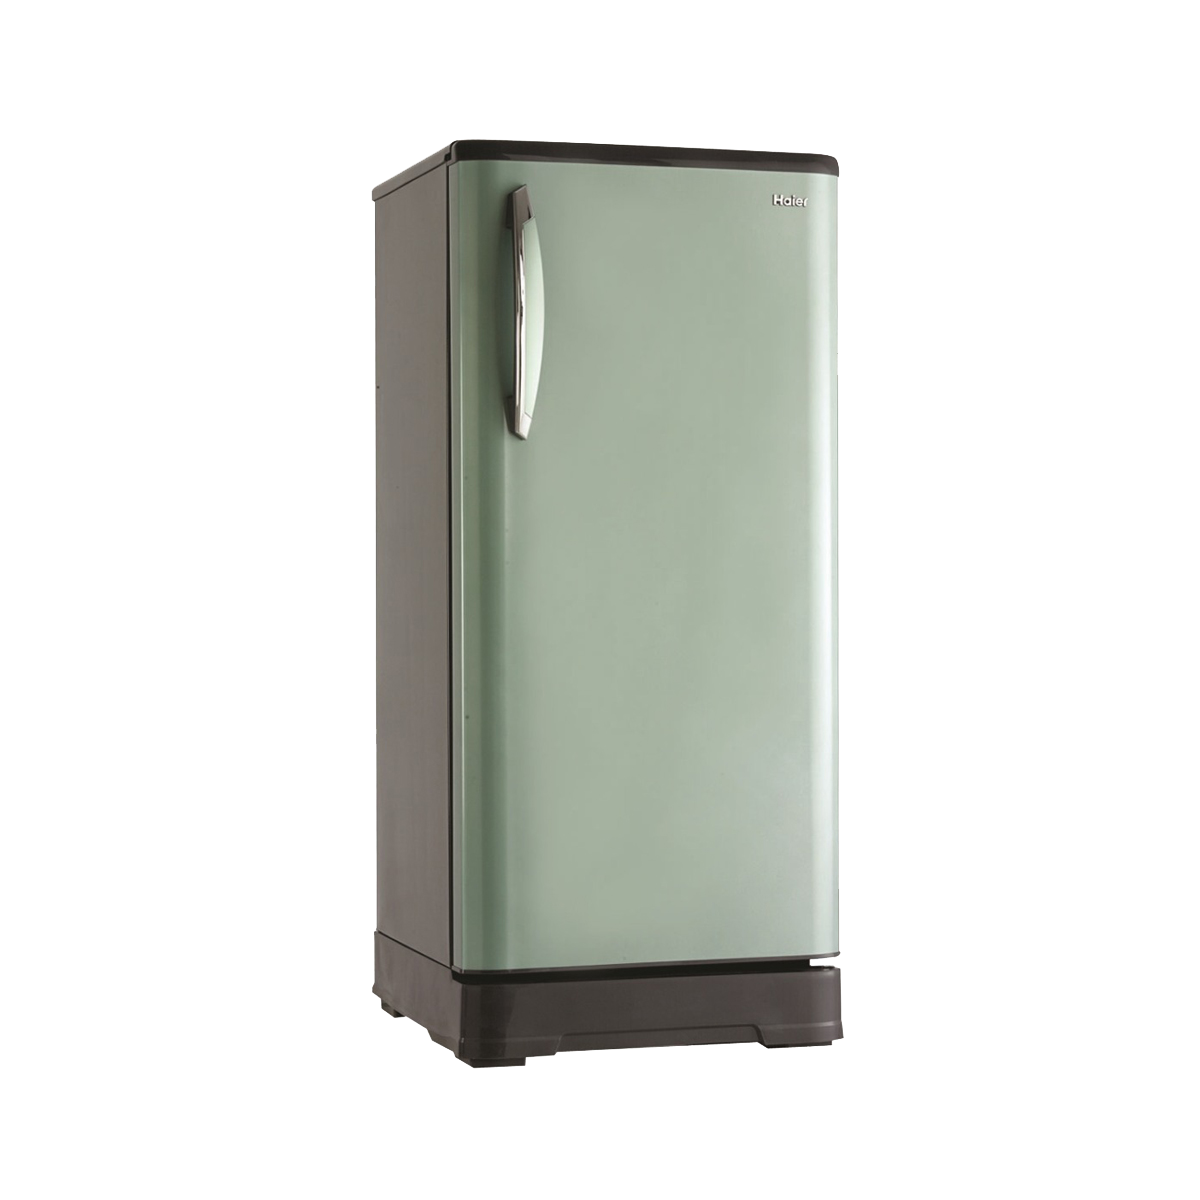 Png transparent images pluspng. Refrigerator clipart refridgerator